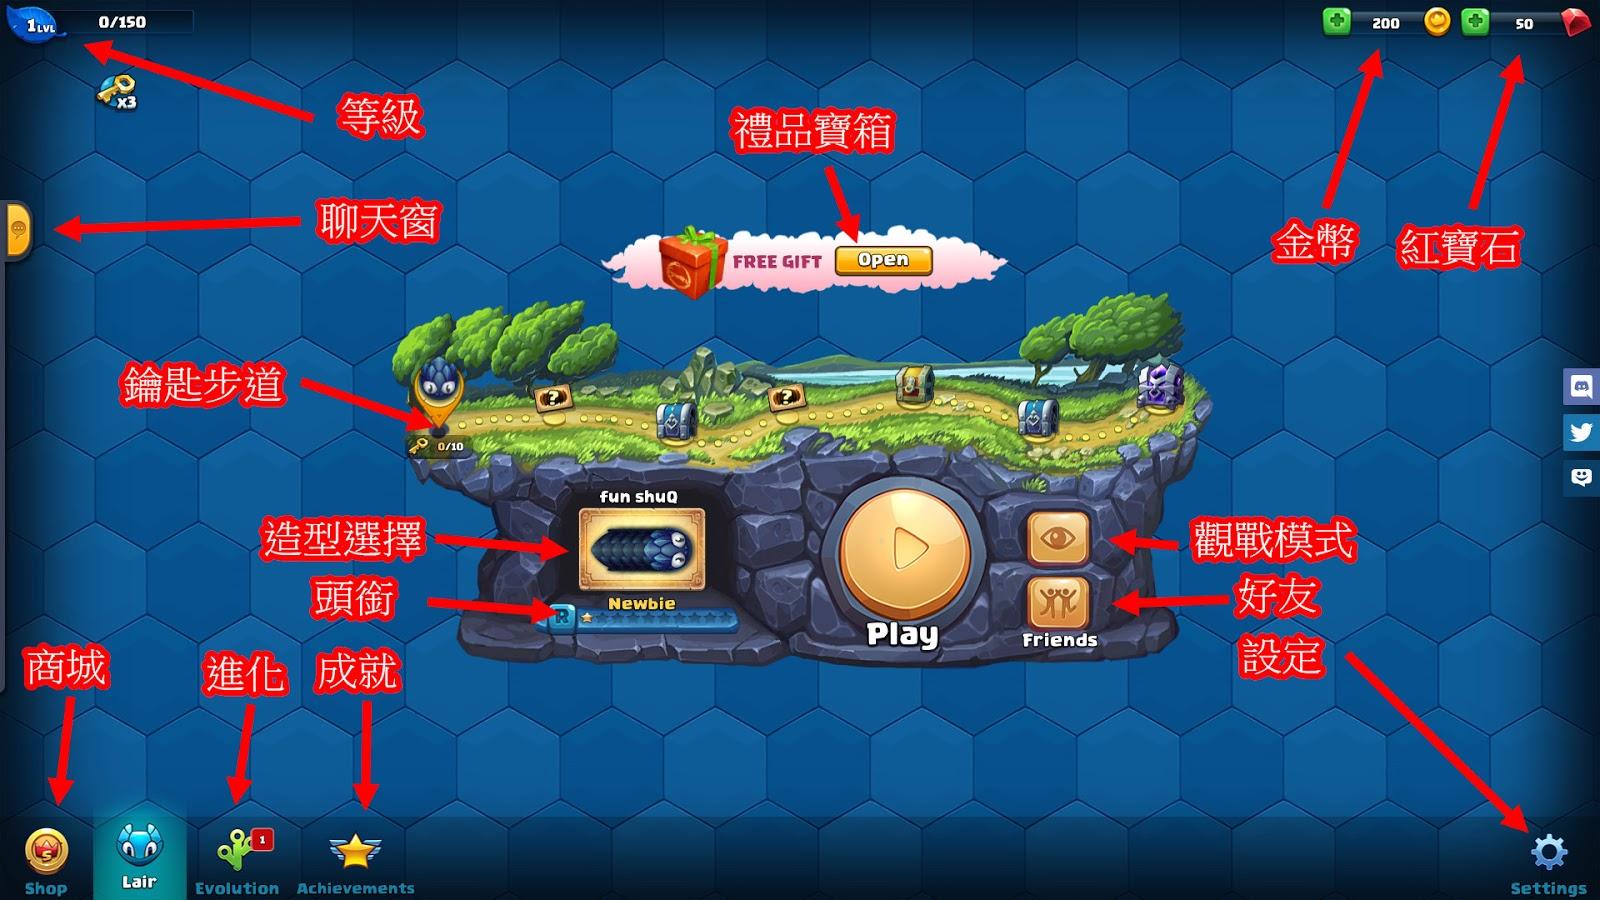 Fun薯瘋: 如何玩【littlebigsnake.io】貪食蛇 - 快速上手介面攻略!